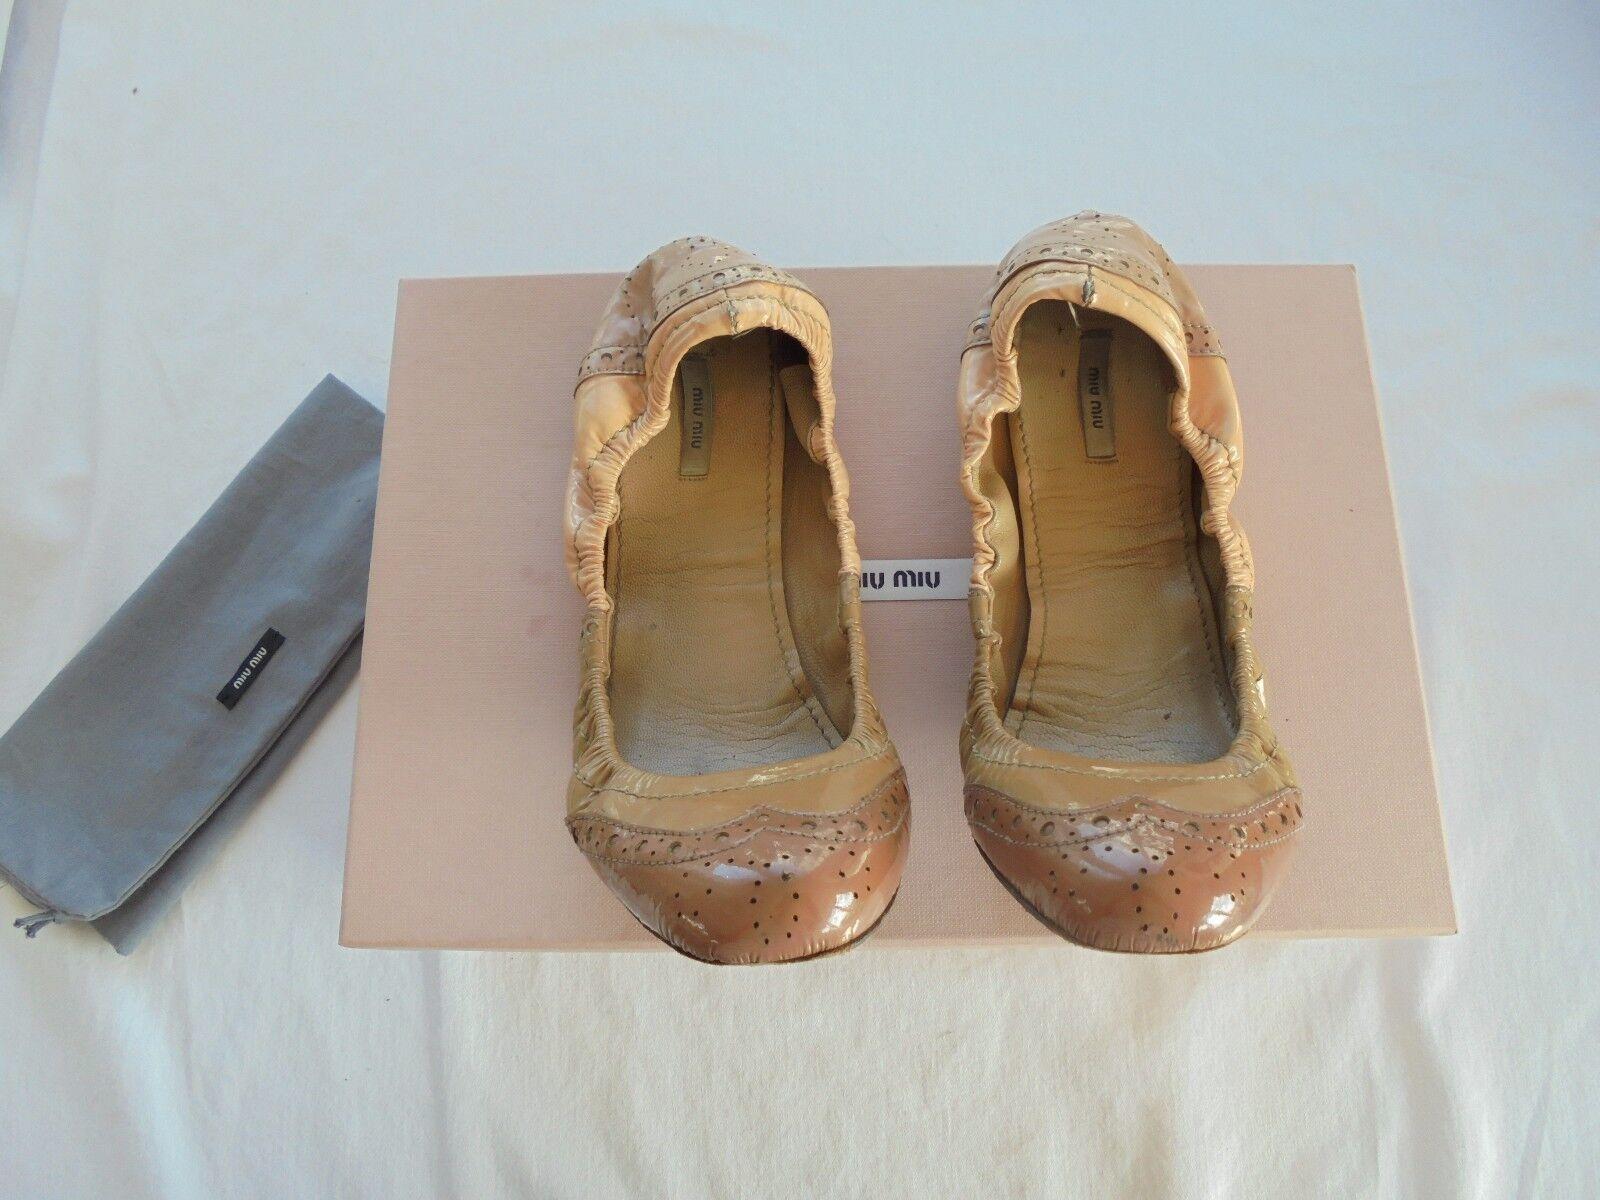 Miu Miu by Prada Leder Nude Ballerinas NP:  Pumps Schuhe Gr. 36,5 37